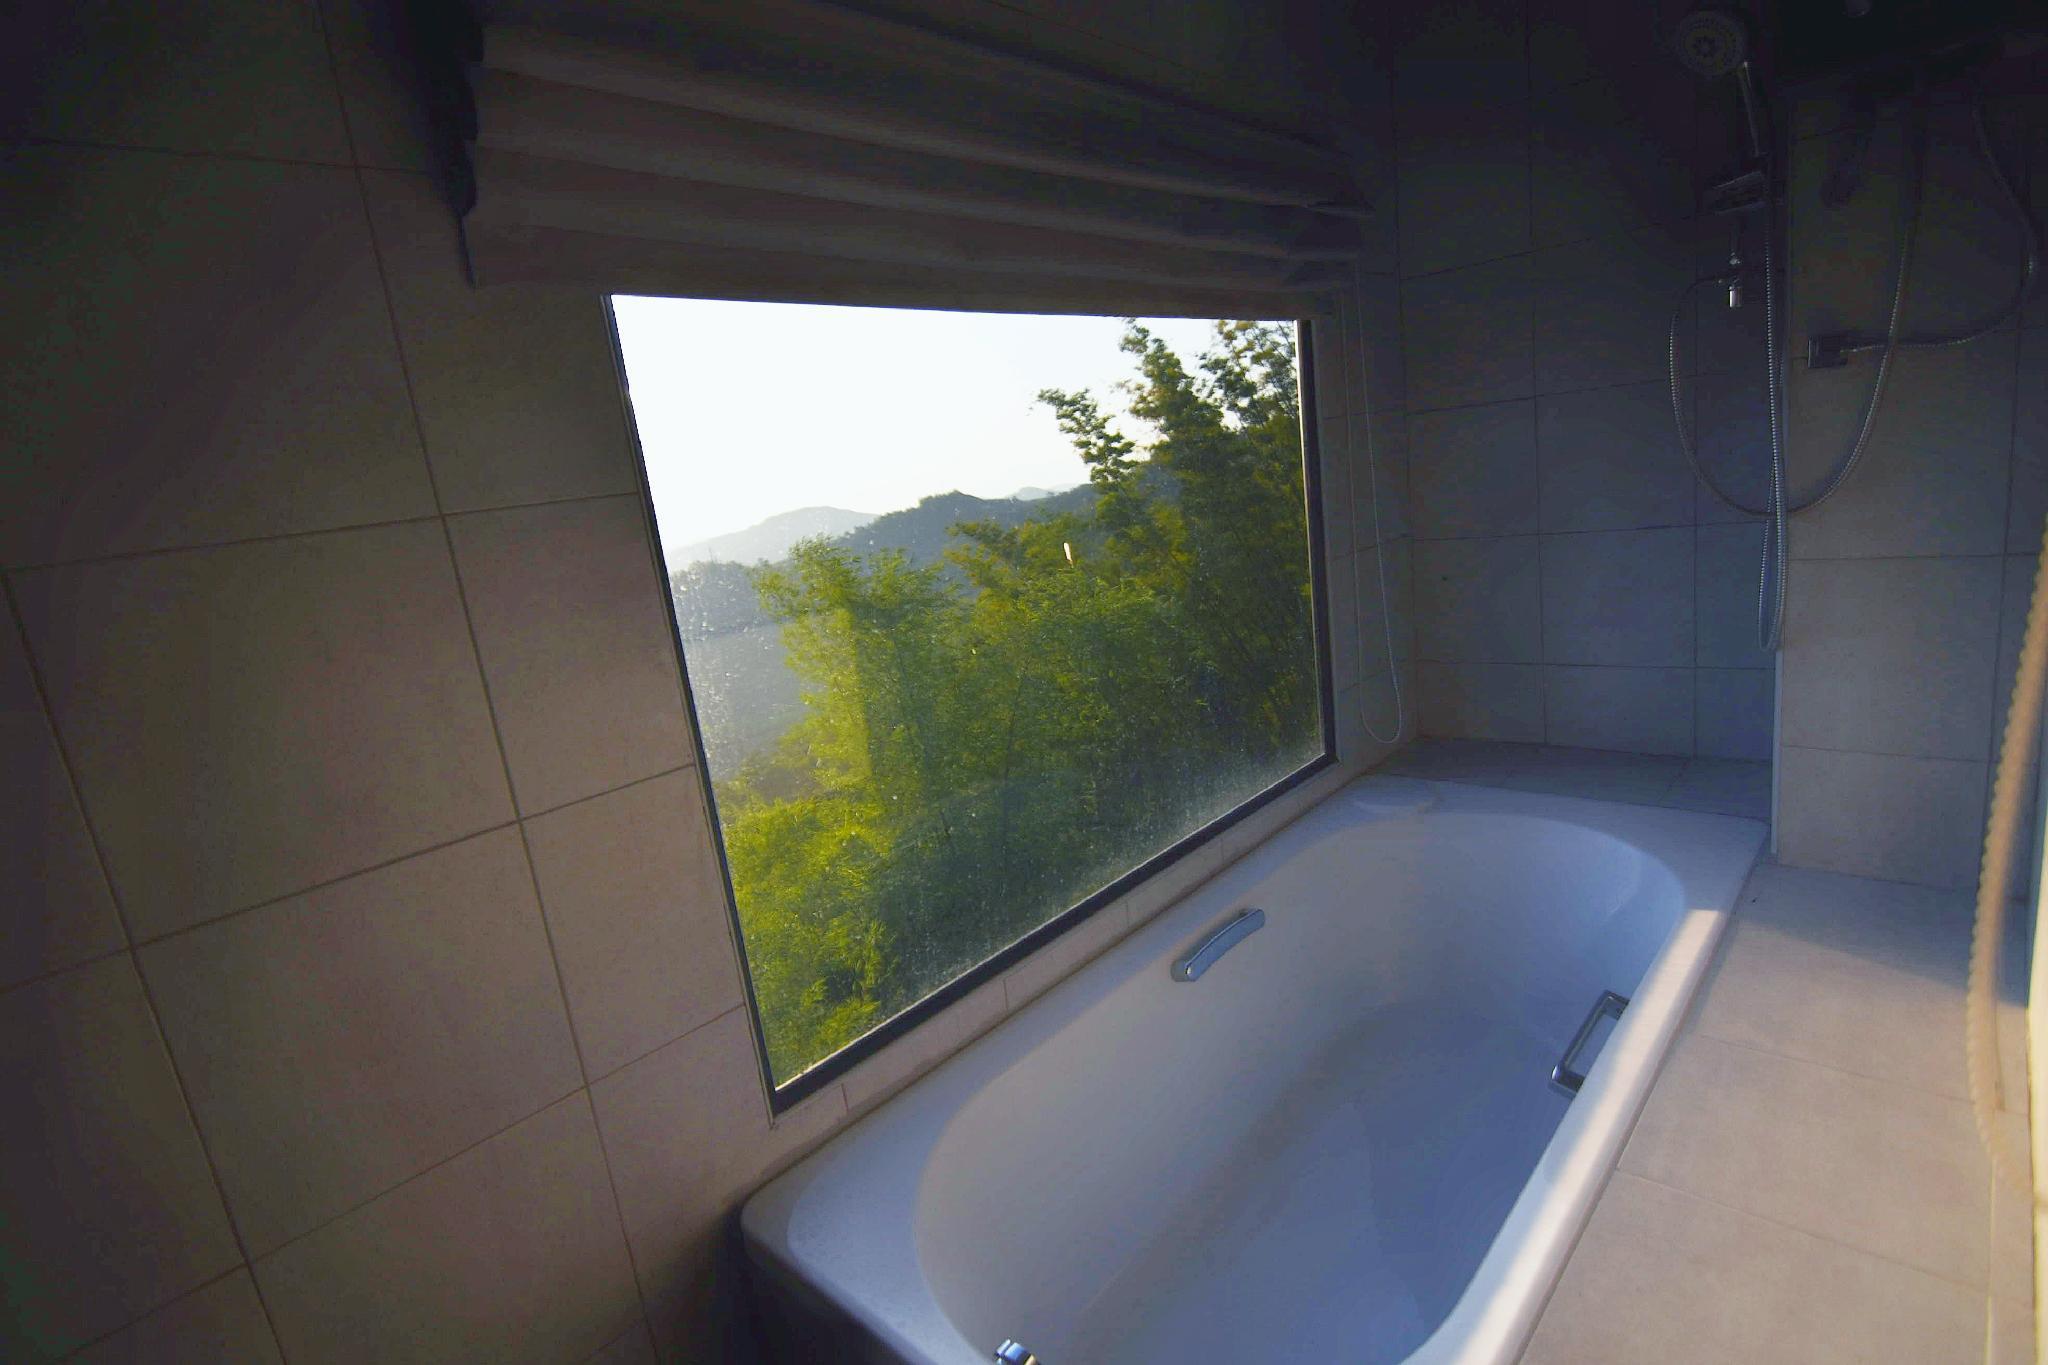 Dragon Hill สตูดิโอ บ้านเดี่ยว 1 ห้องน้ำส่วนตัว ขนาด 26 ตร.ม. – แคมป์สน